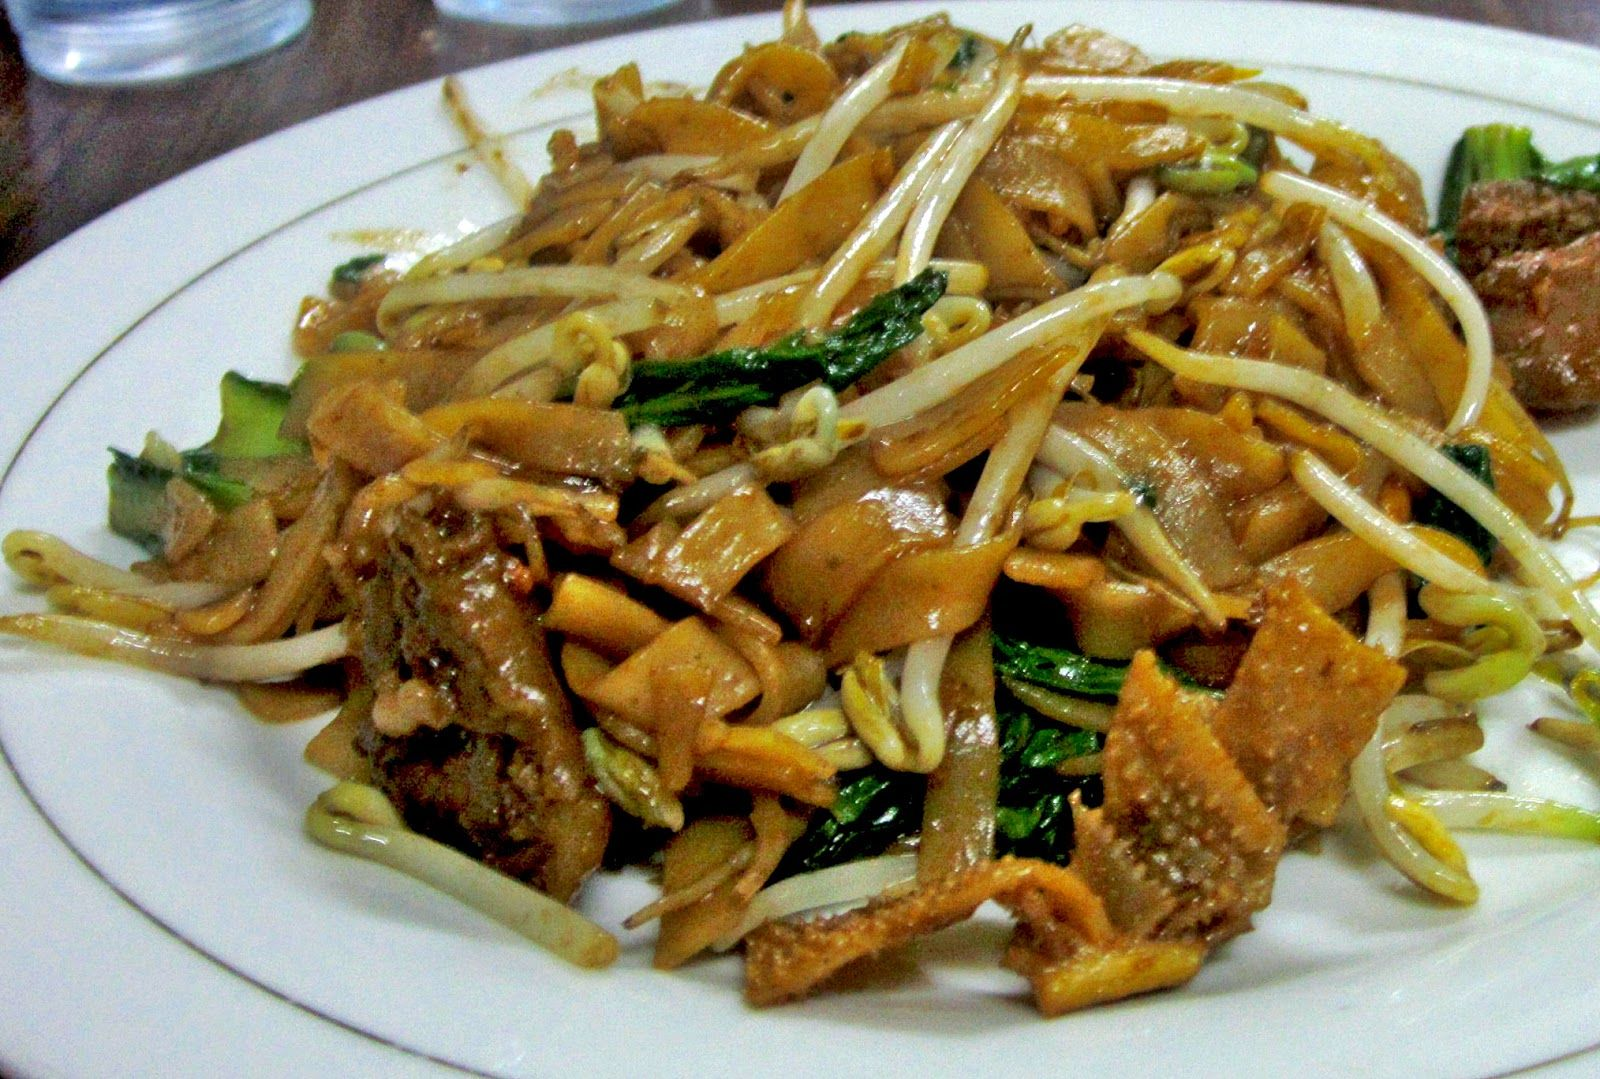 Resep Mie Tiaw Goreng Aneka Resep Masakan Resep Masakan Resep Masakan